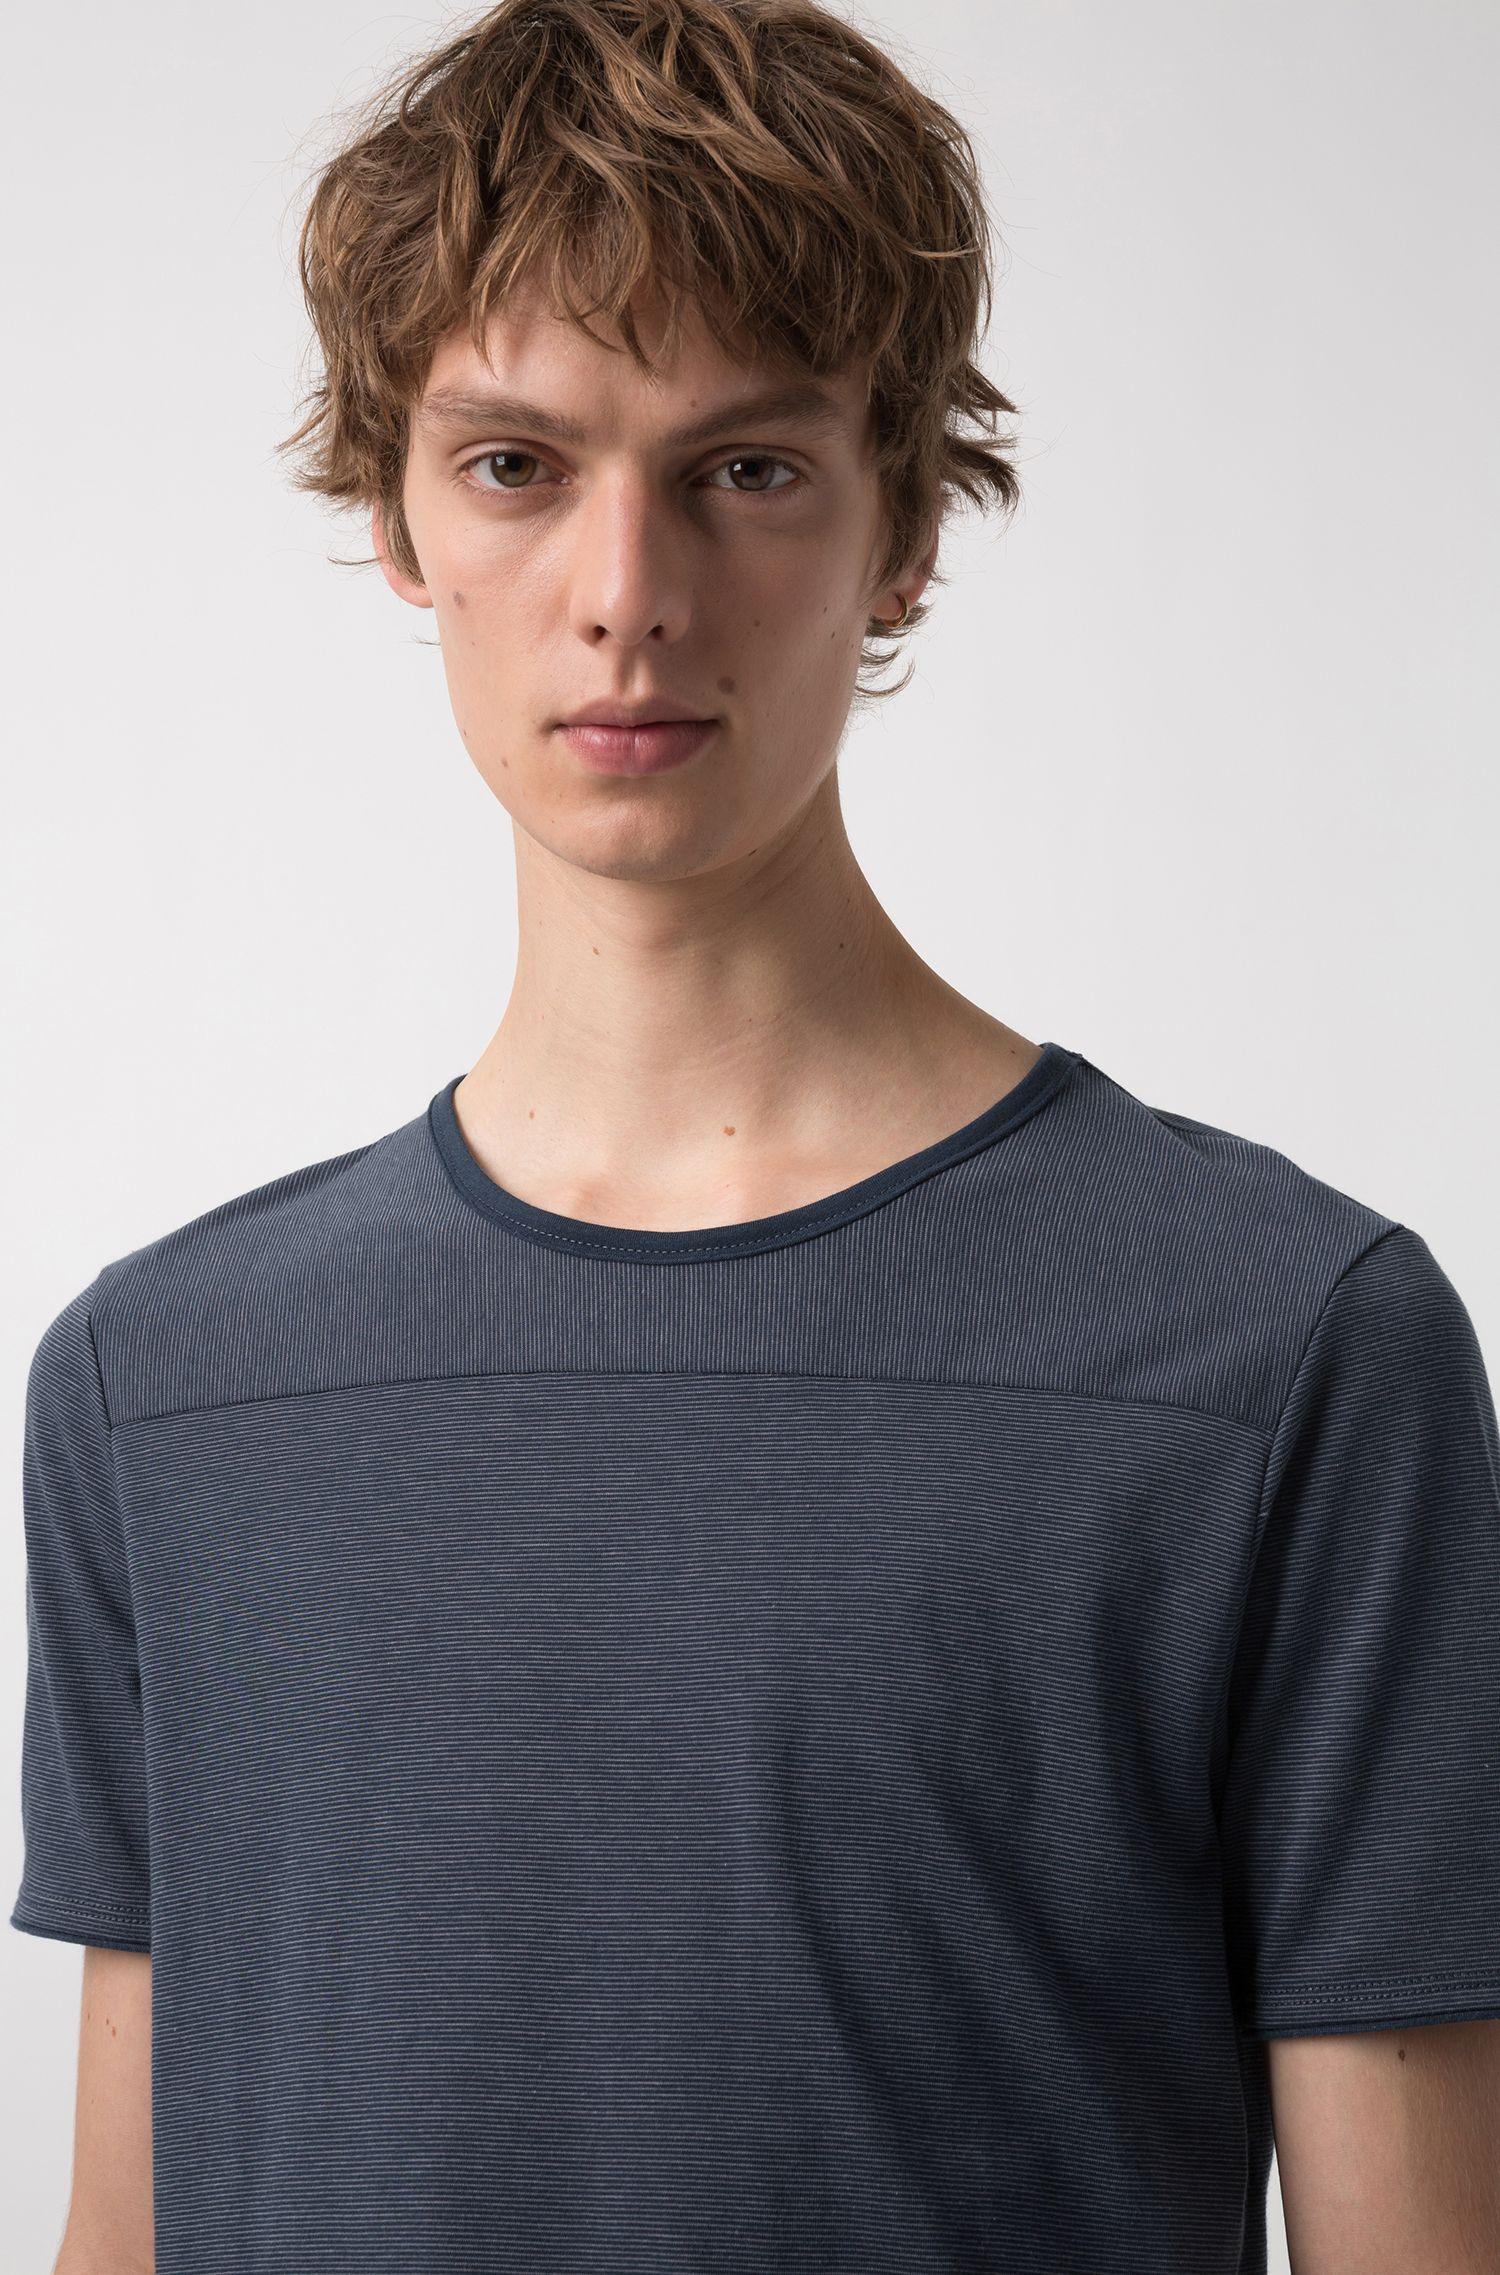 Crew-neck T-shirt in Pima cotton with spliced stripes, Dark Blue